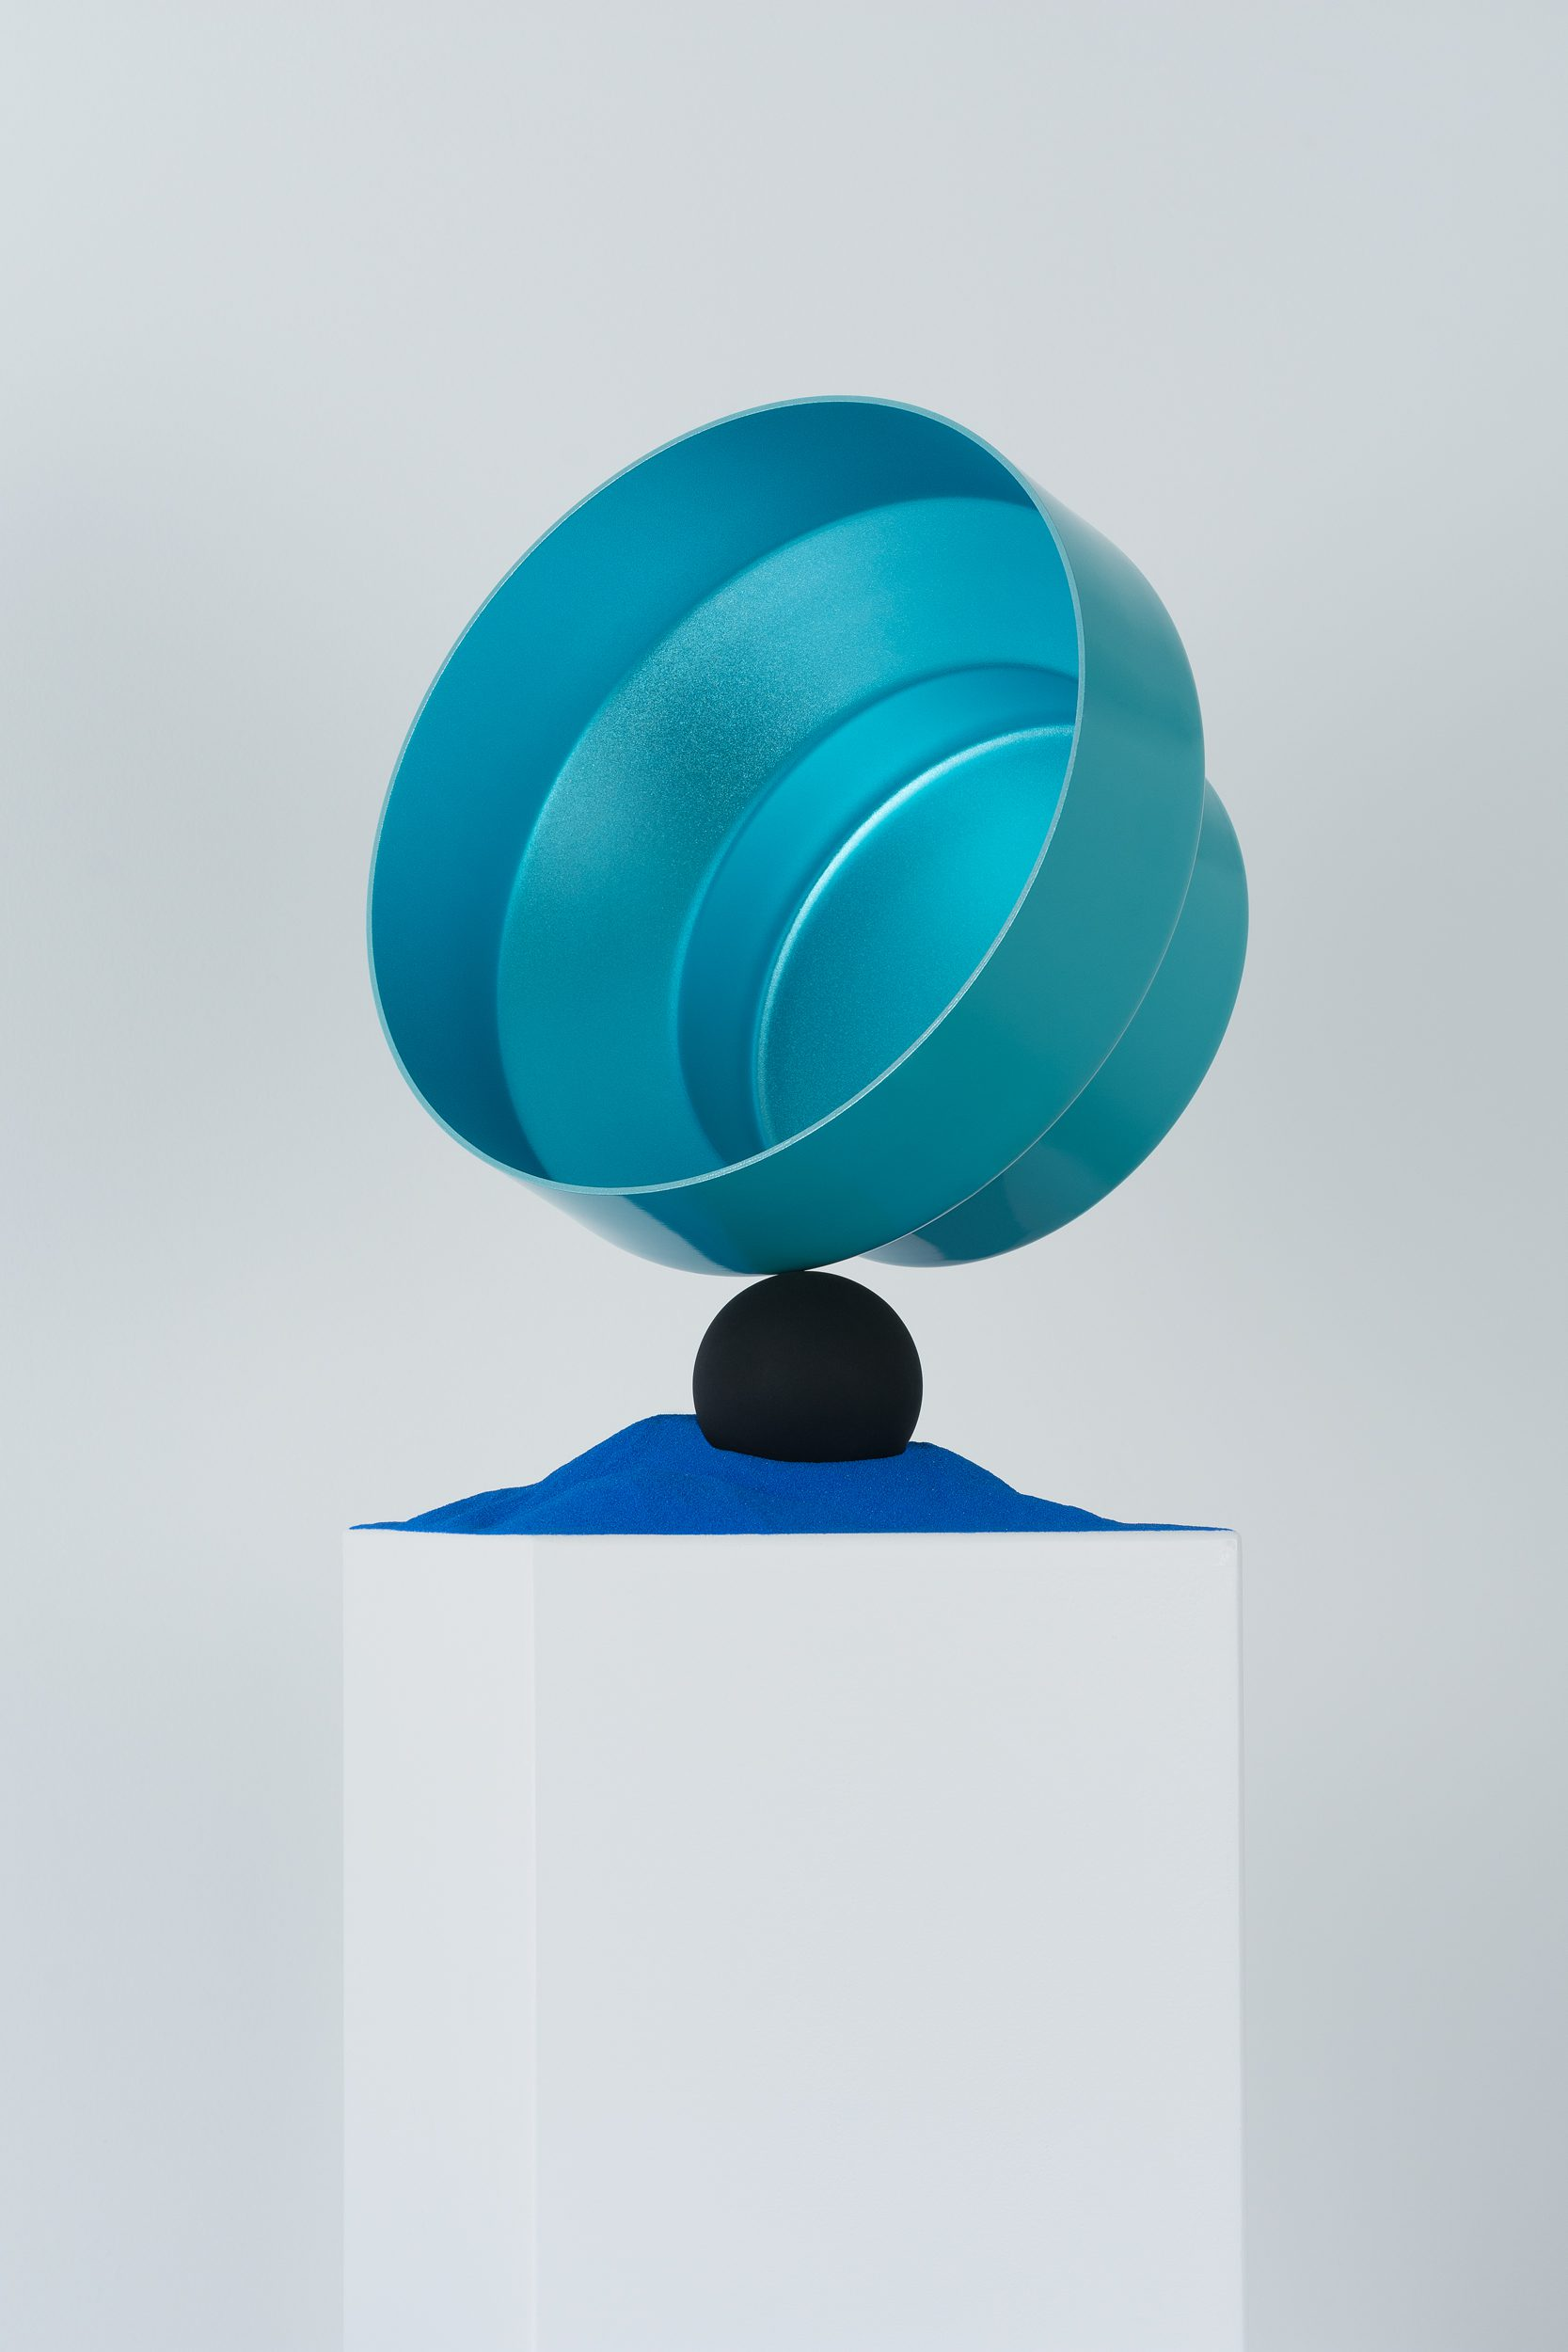 Normann_Copenhagen-Meta-Bowl-Turquoise-SH_01-01©Aivaras_Simonis